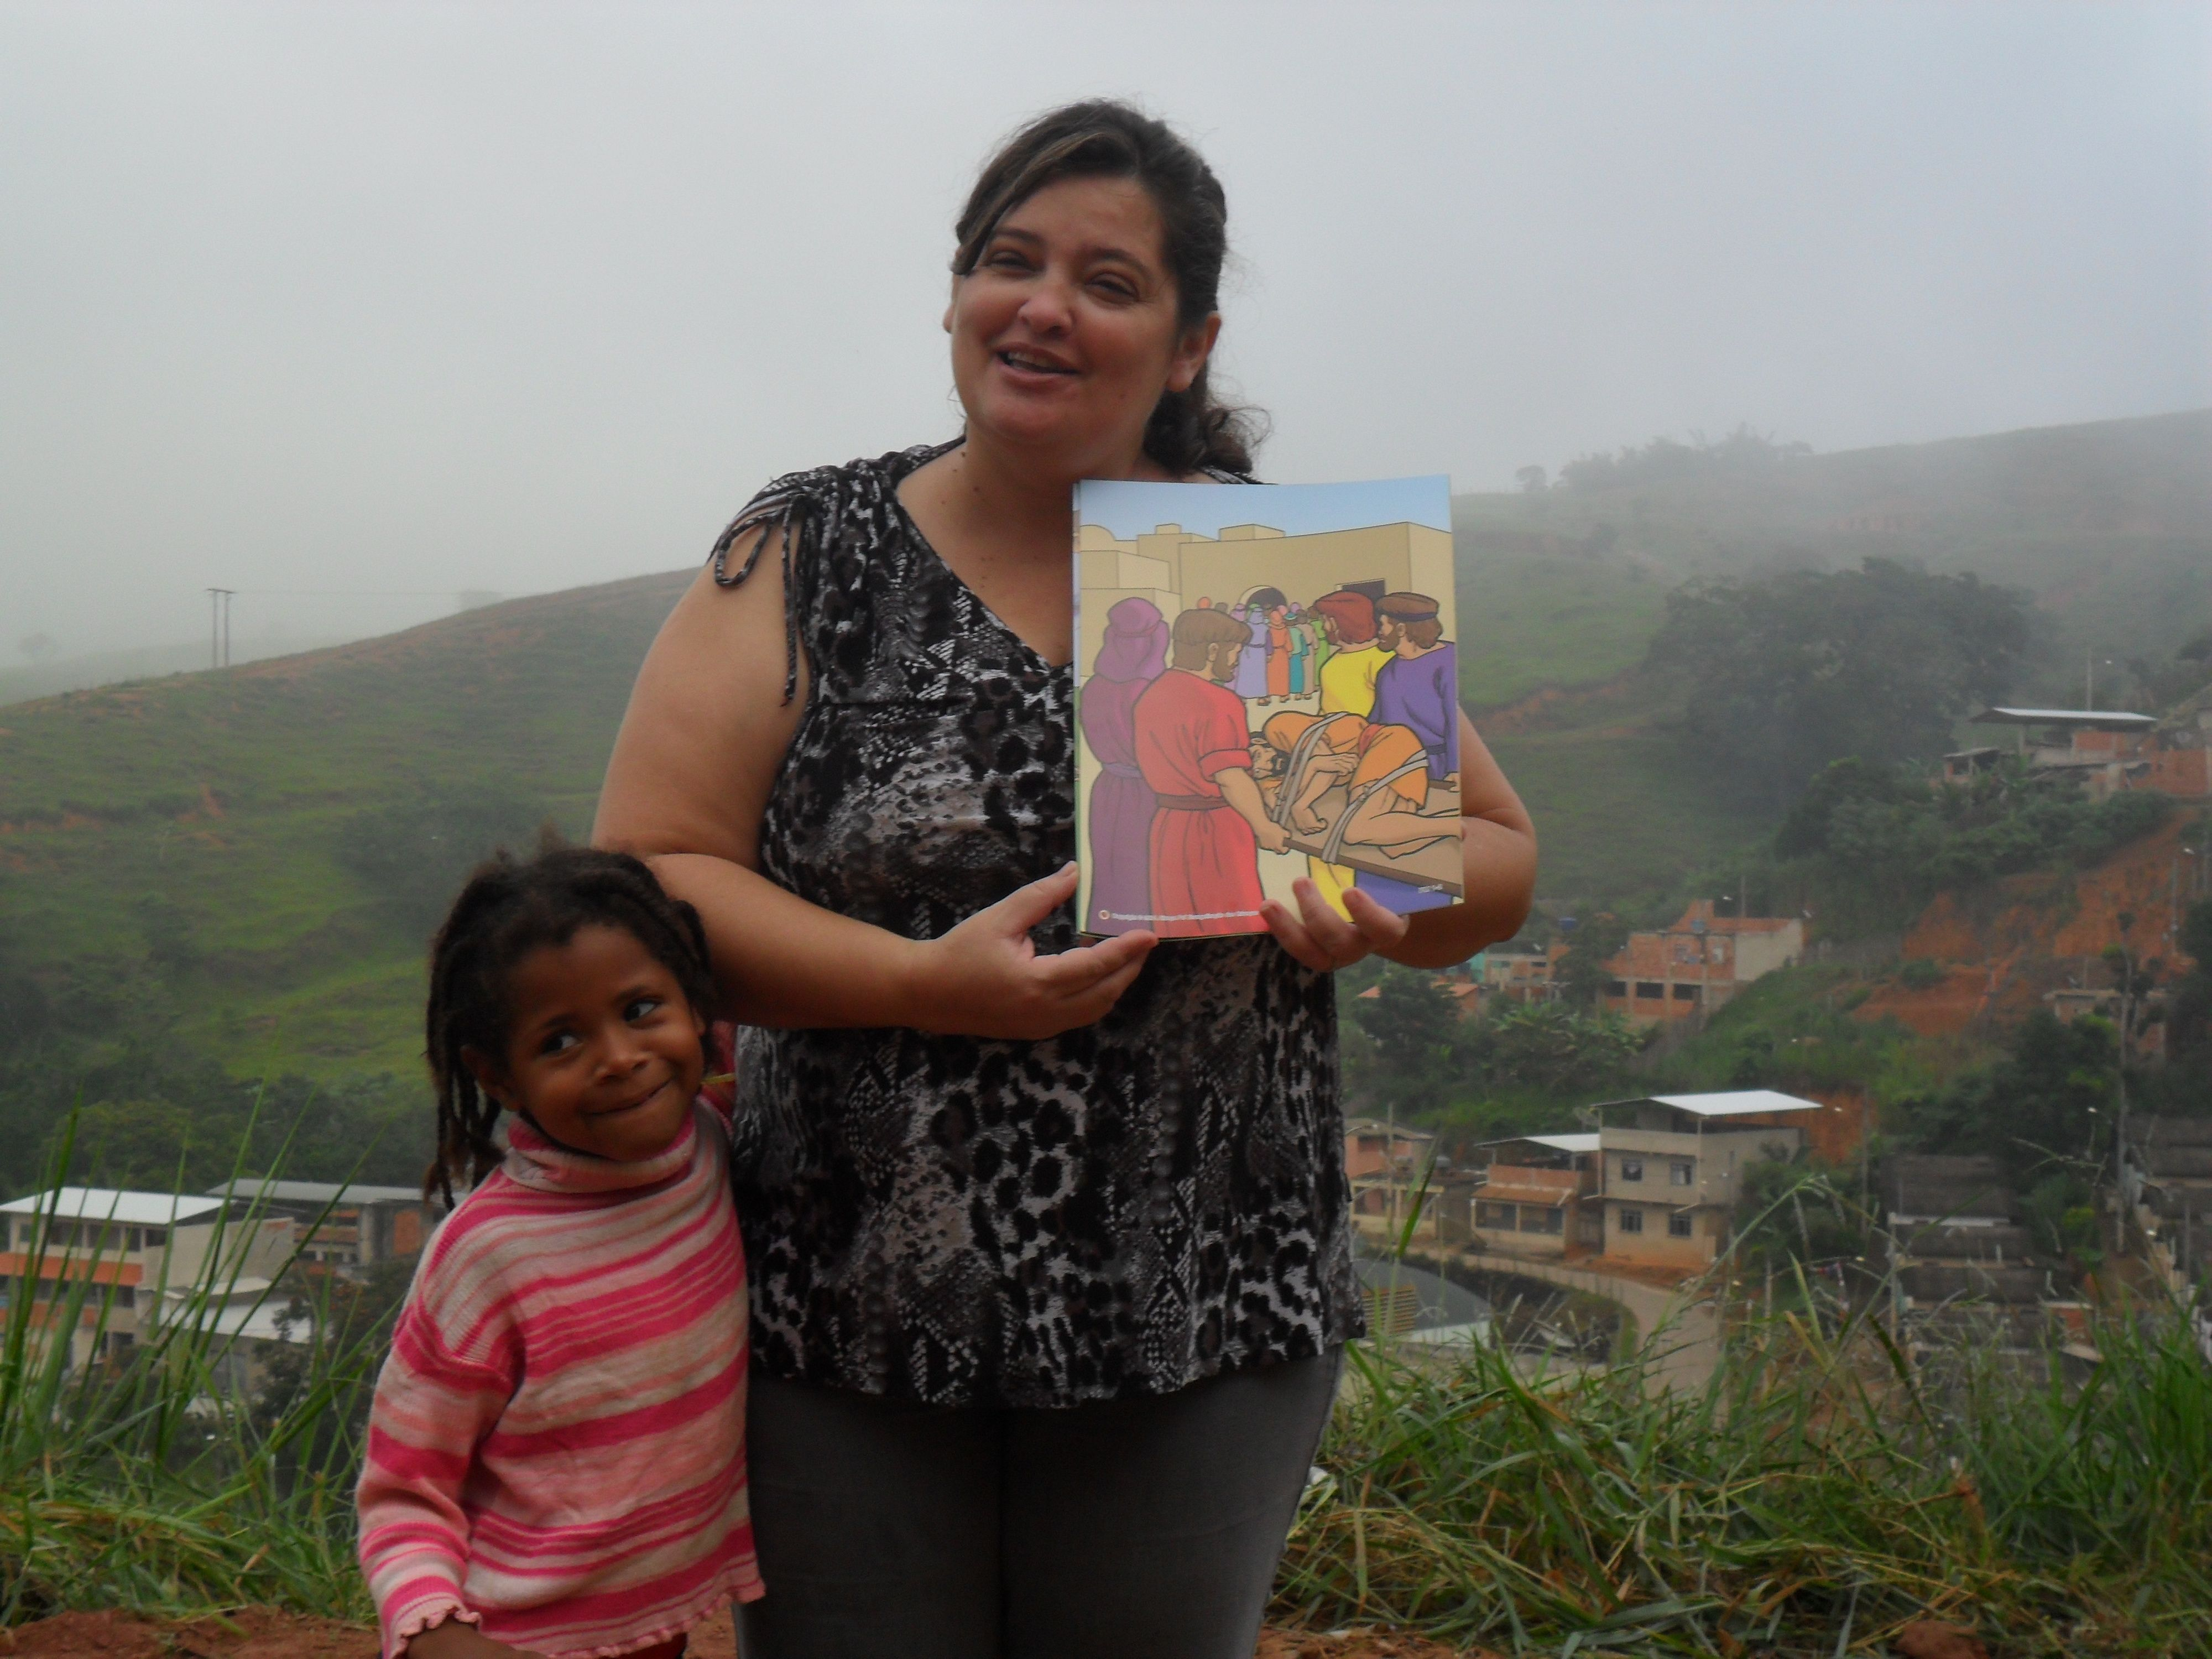 Evangelizando No Bairro Irma Dulce Pequeninos E O Pequenino